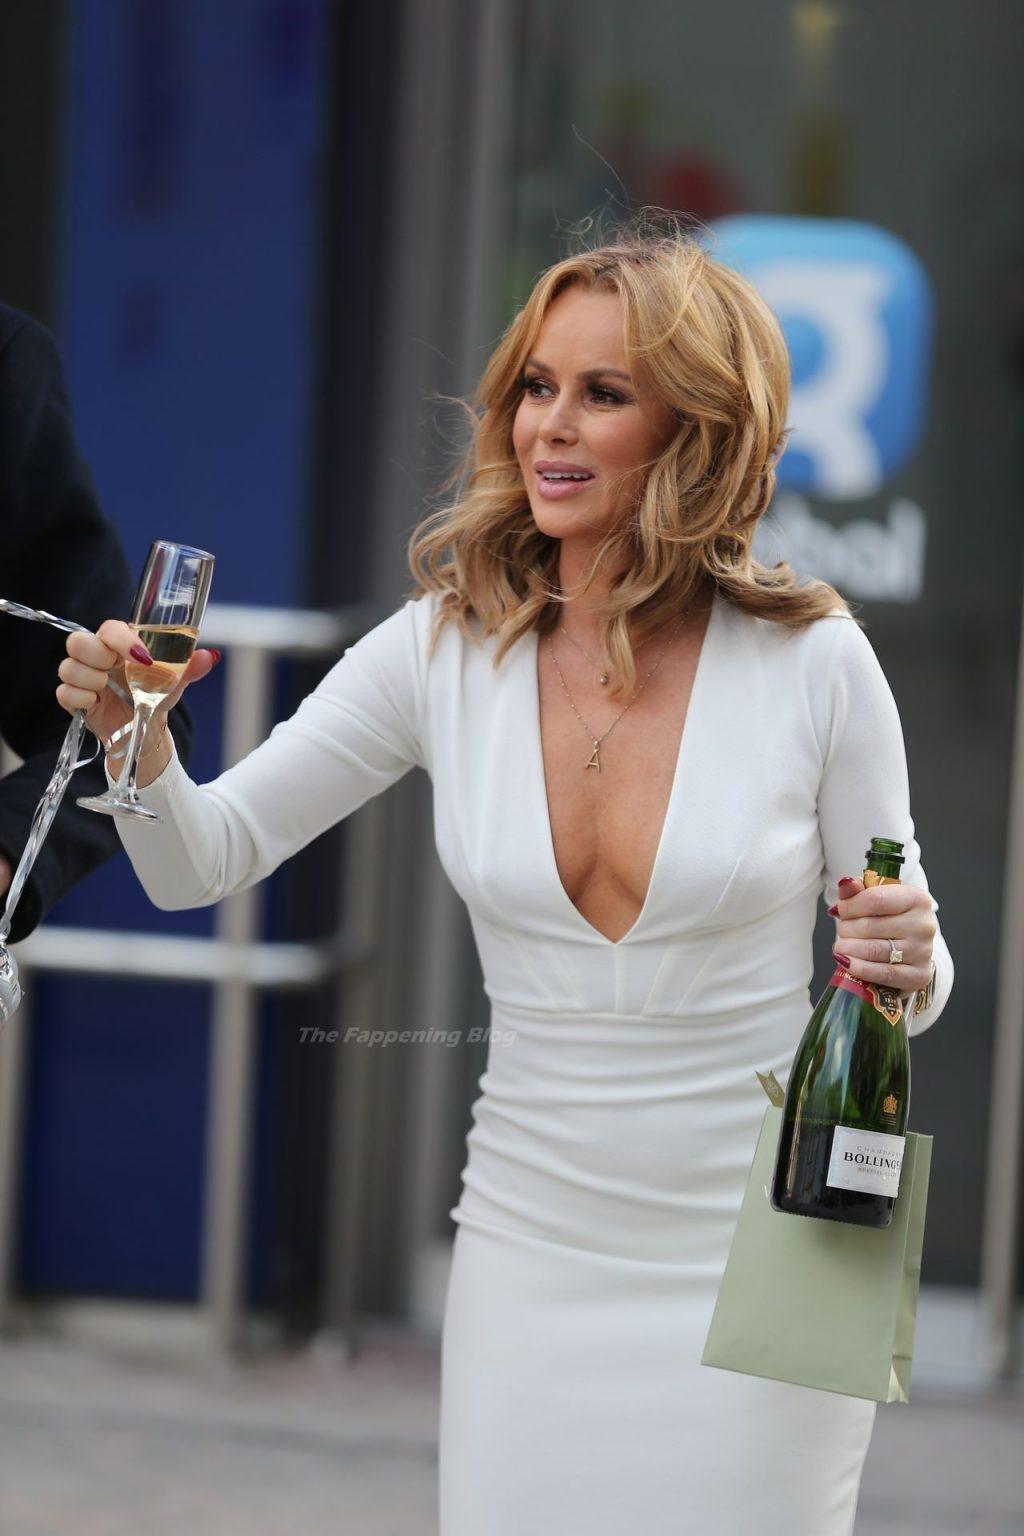 Braless Amanda Holden Shows Her Cleavage Celebrating Her Birthday (62 Photos)